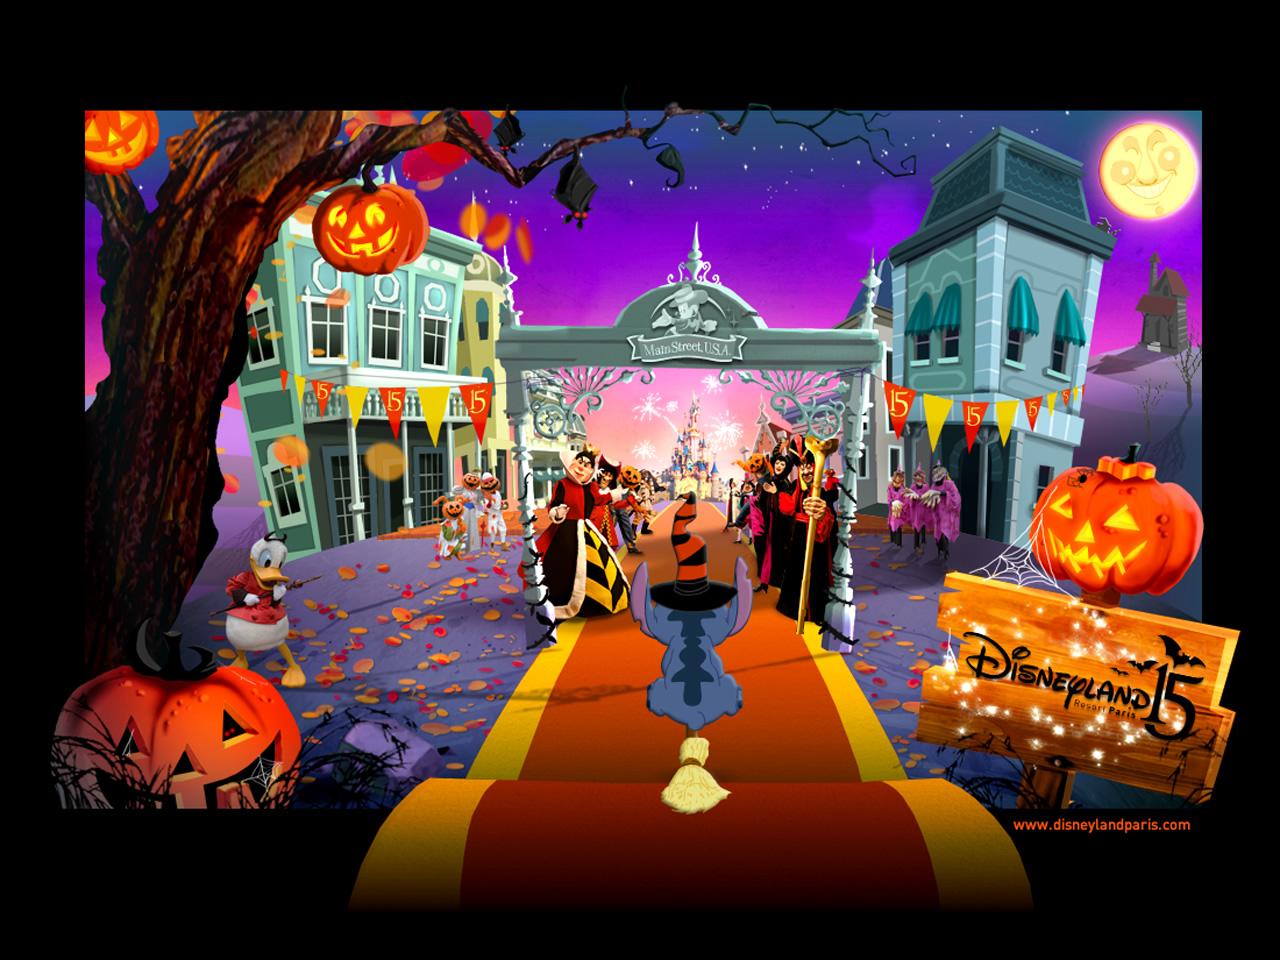 Halloween 2012 wallpaper for Disneys fan Wallpaper for holiday 1280x960